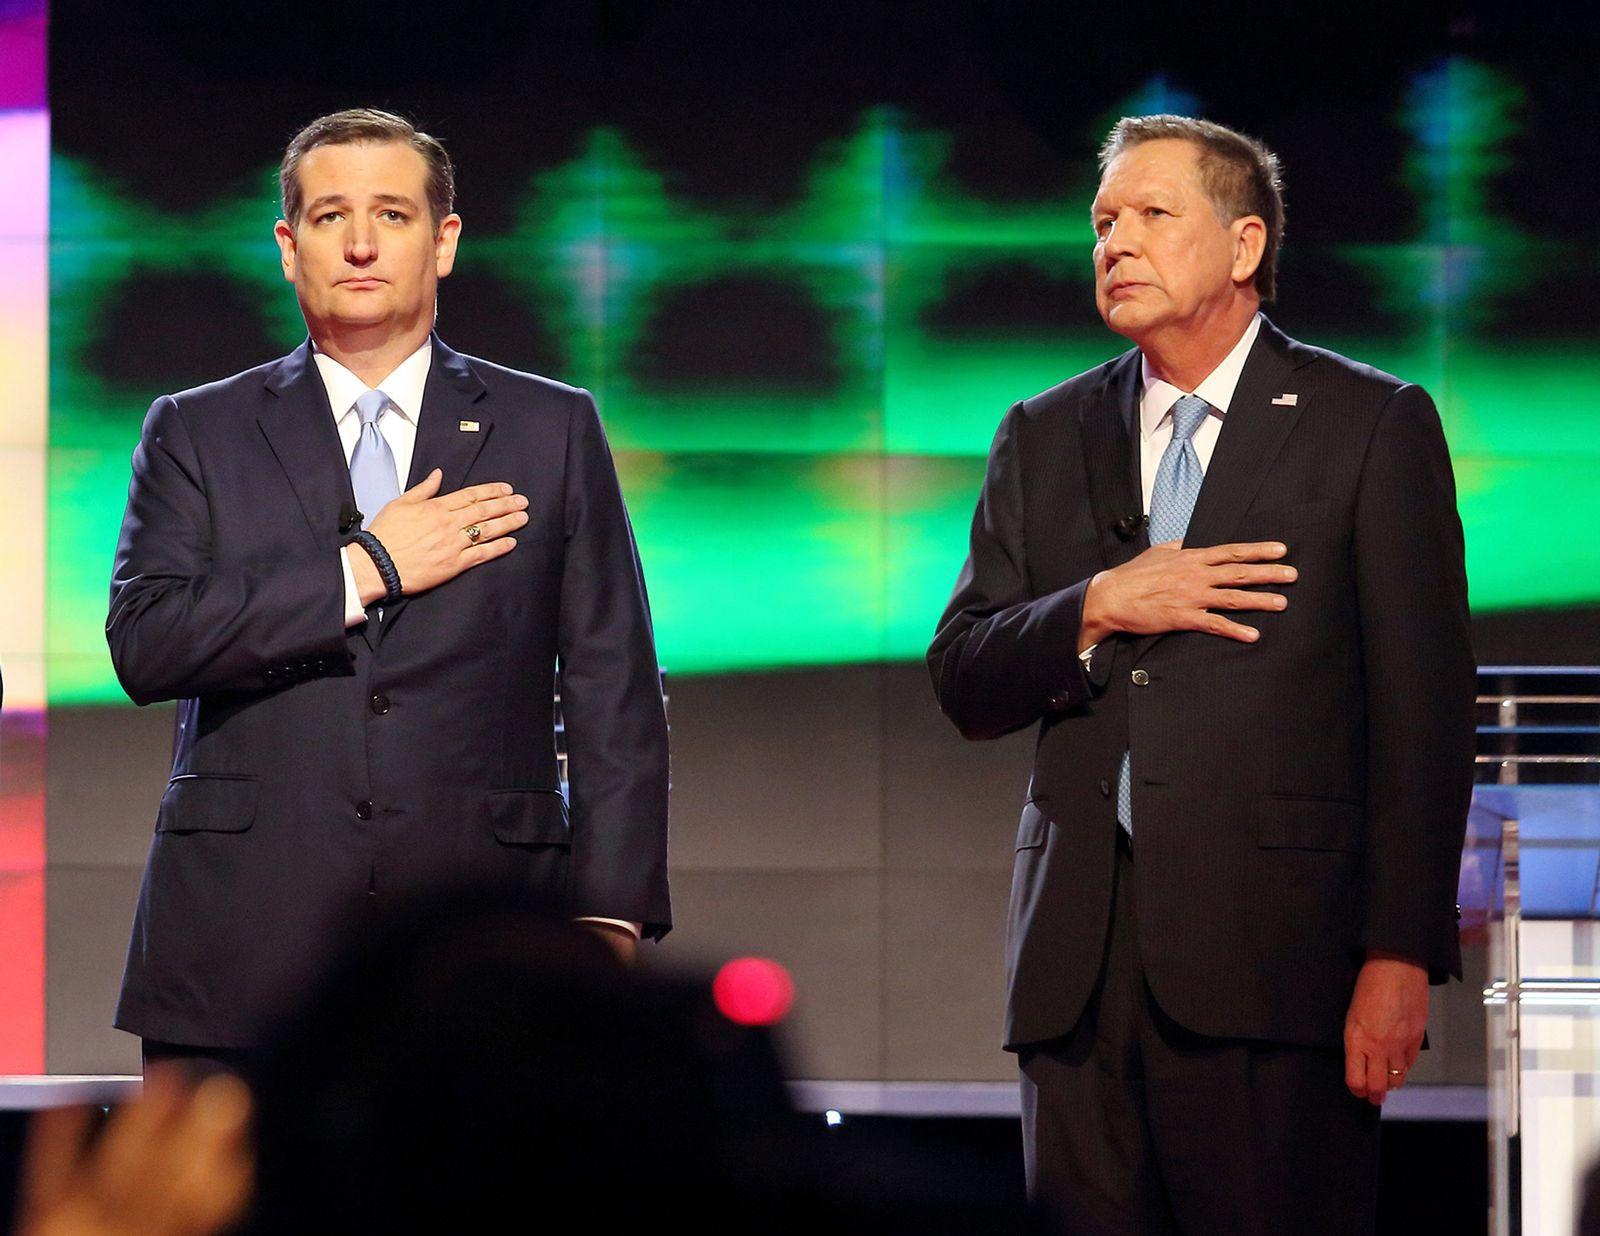 John Kasich / Ted Cruz